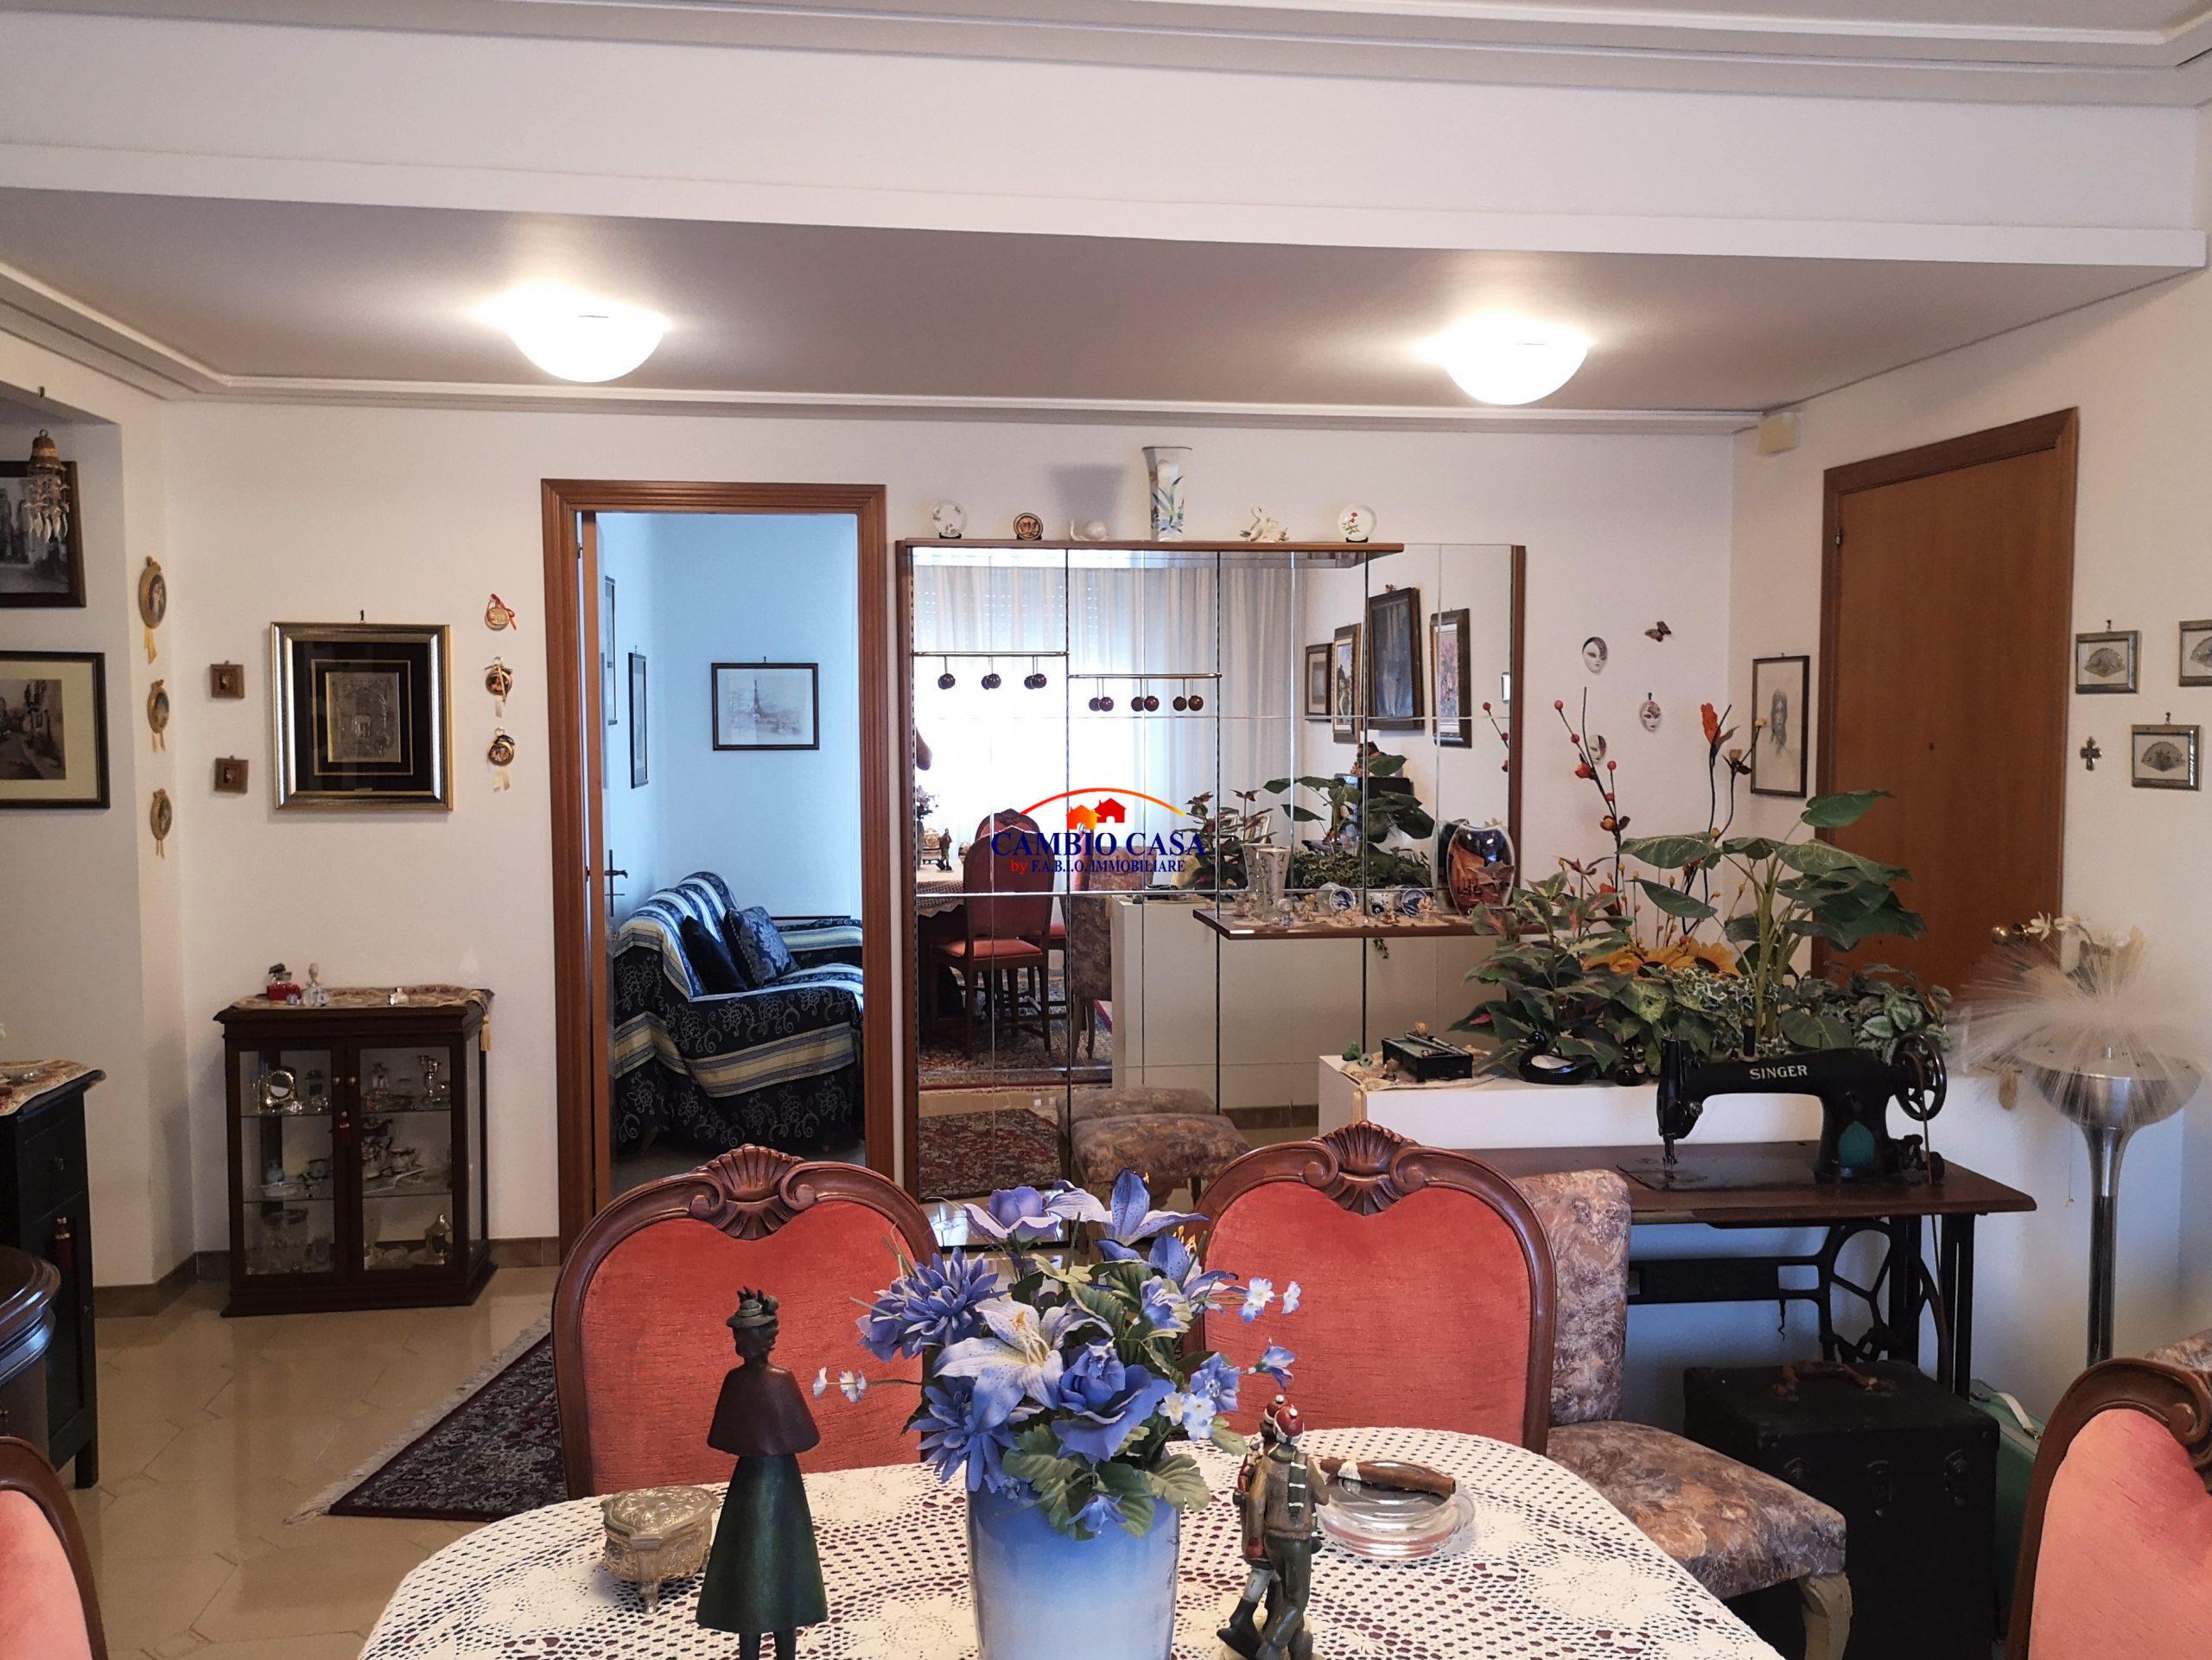 Ragusa, Zona Chiesa San Giuseppe Artigiano – Appartamento mq. 120 Garage e Posto Auto